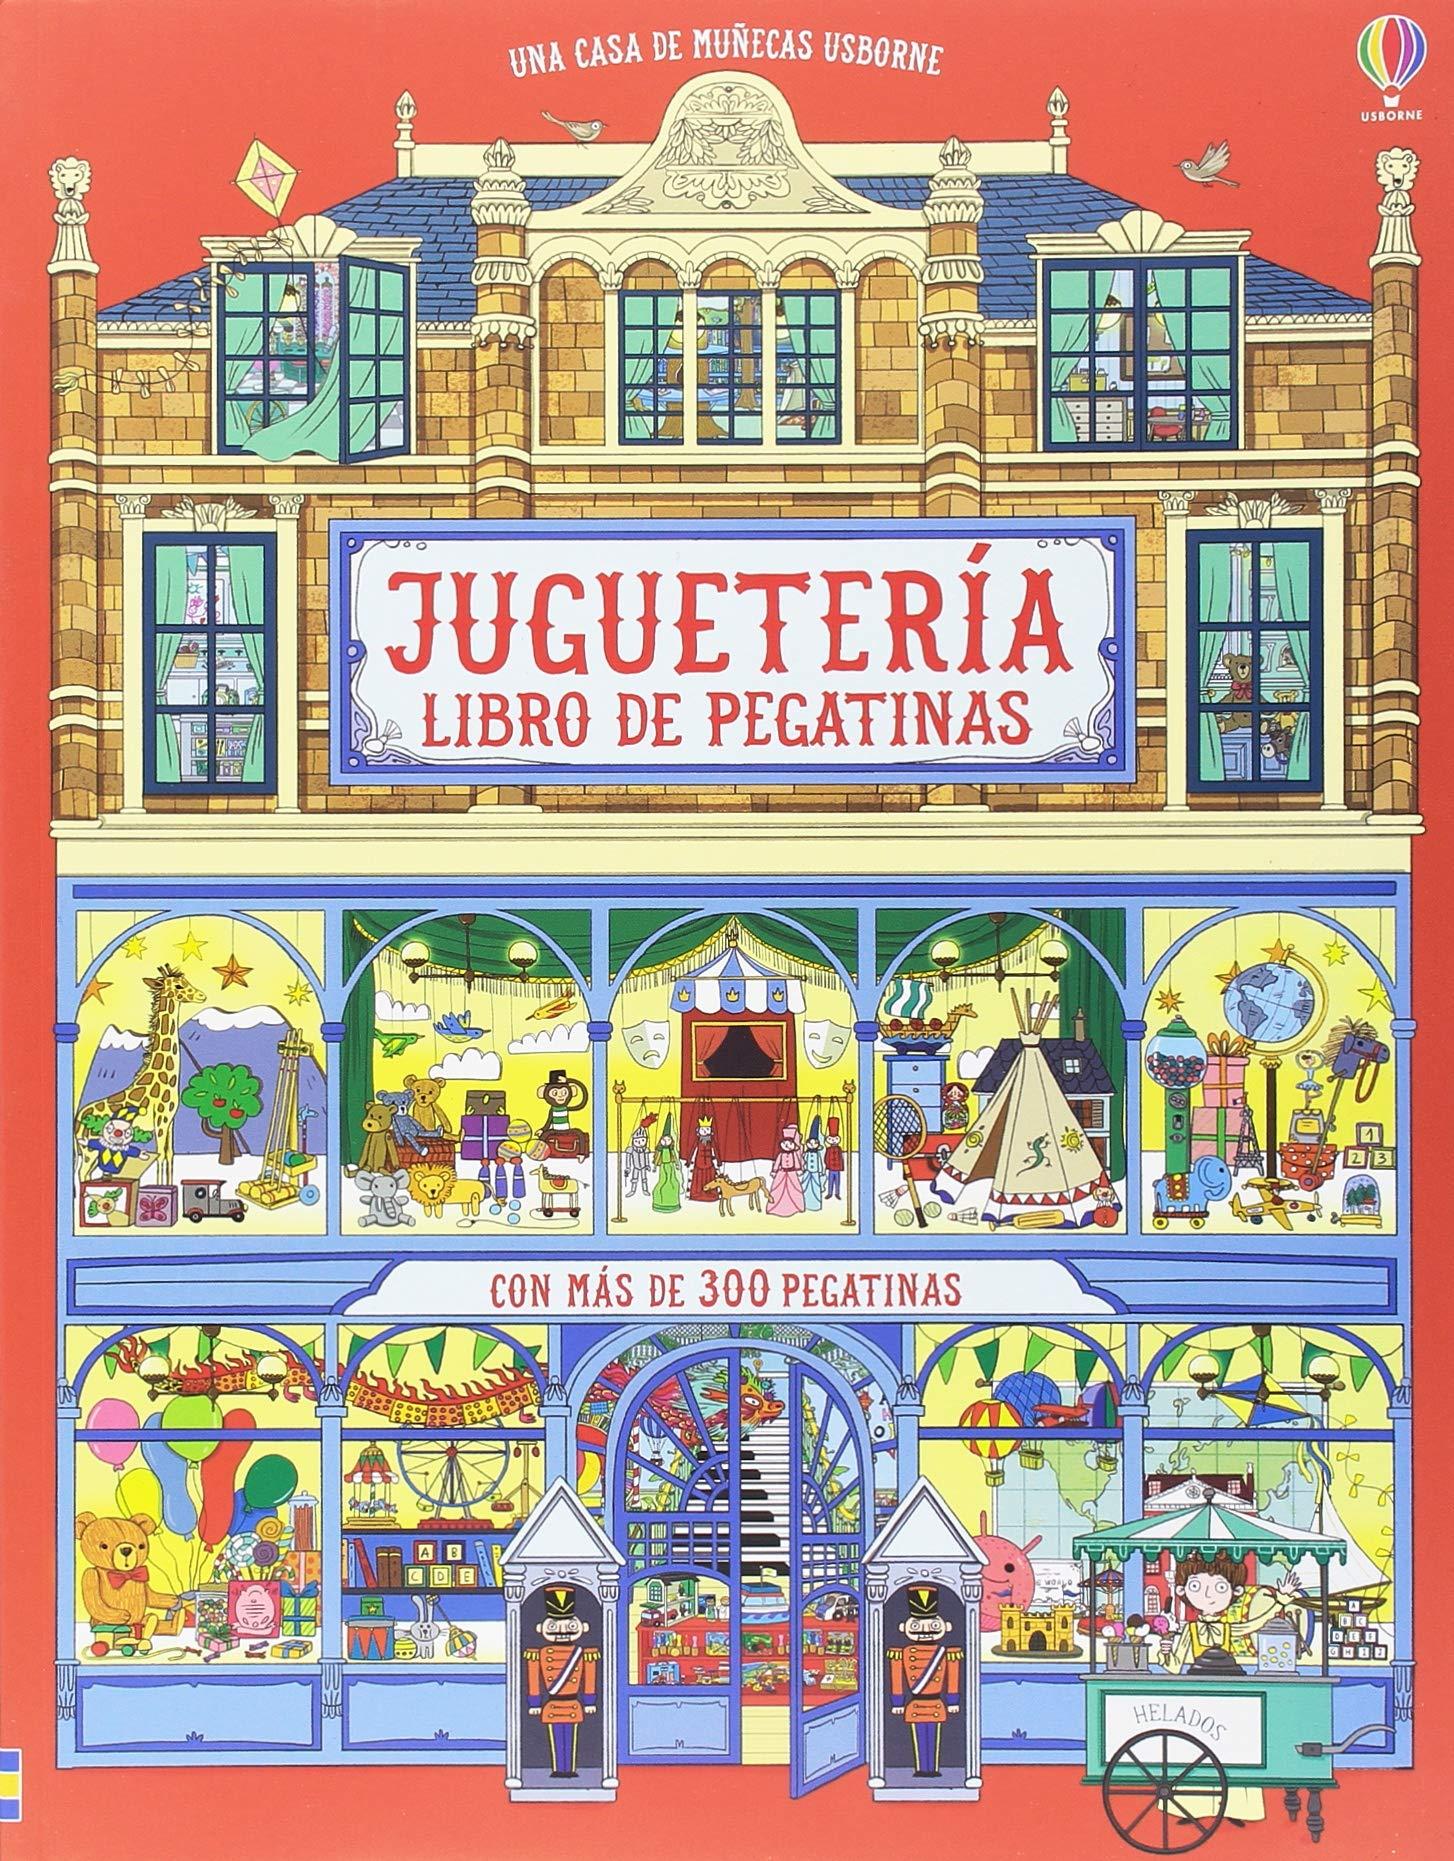 Jugueteria: Salcedo Erica: 9781474949217: Amazon.com: Books